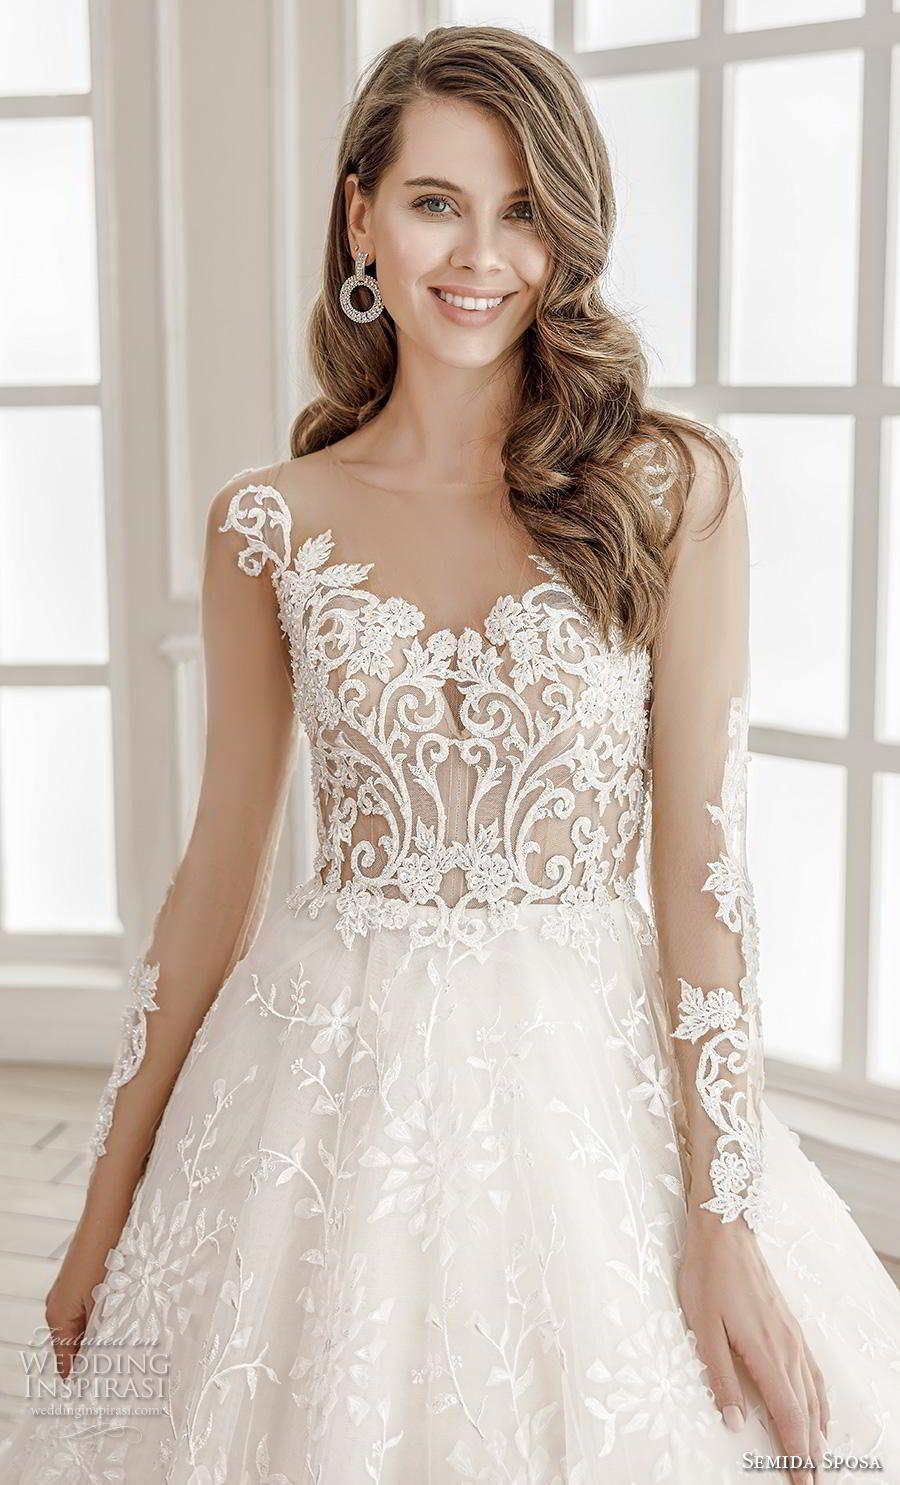 Semida Sposa 2020 Wedding Dresses Amazon Bridal Collection Wedding Inspirasi Wedding Dresses Amazon Wedding Dresses Romantic Event Dresses